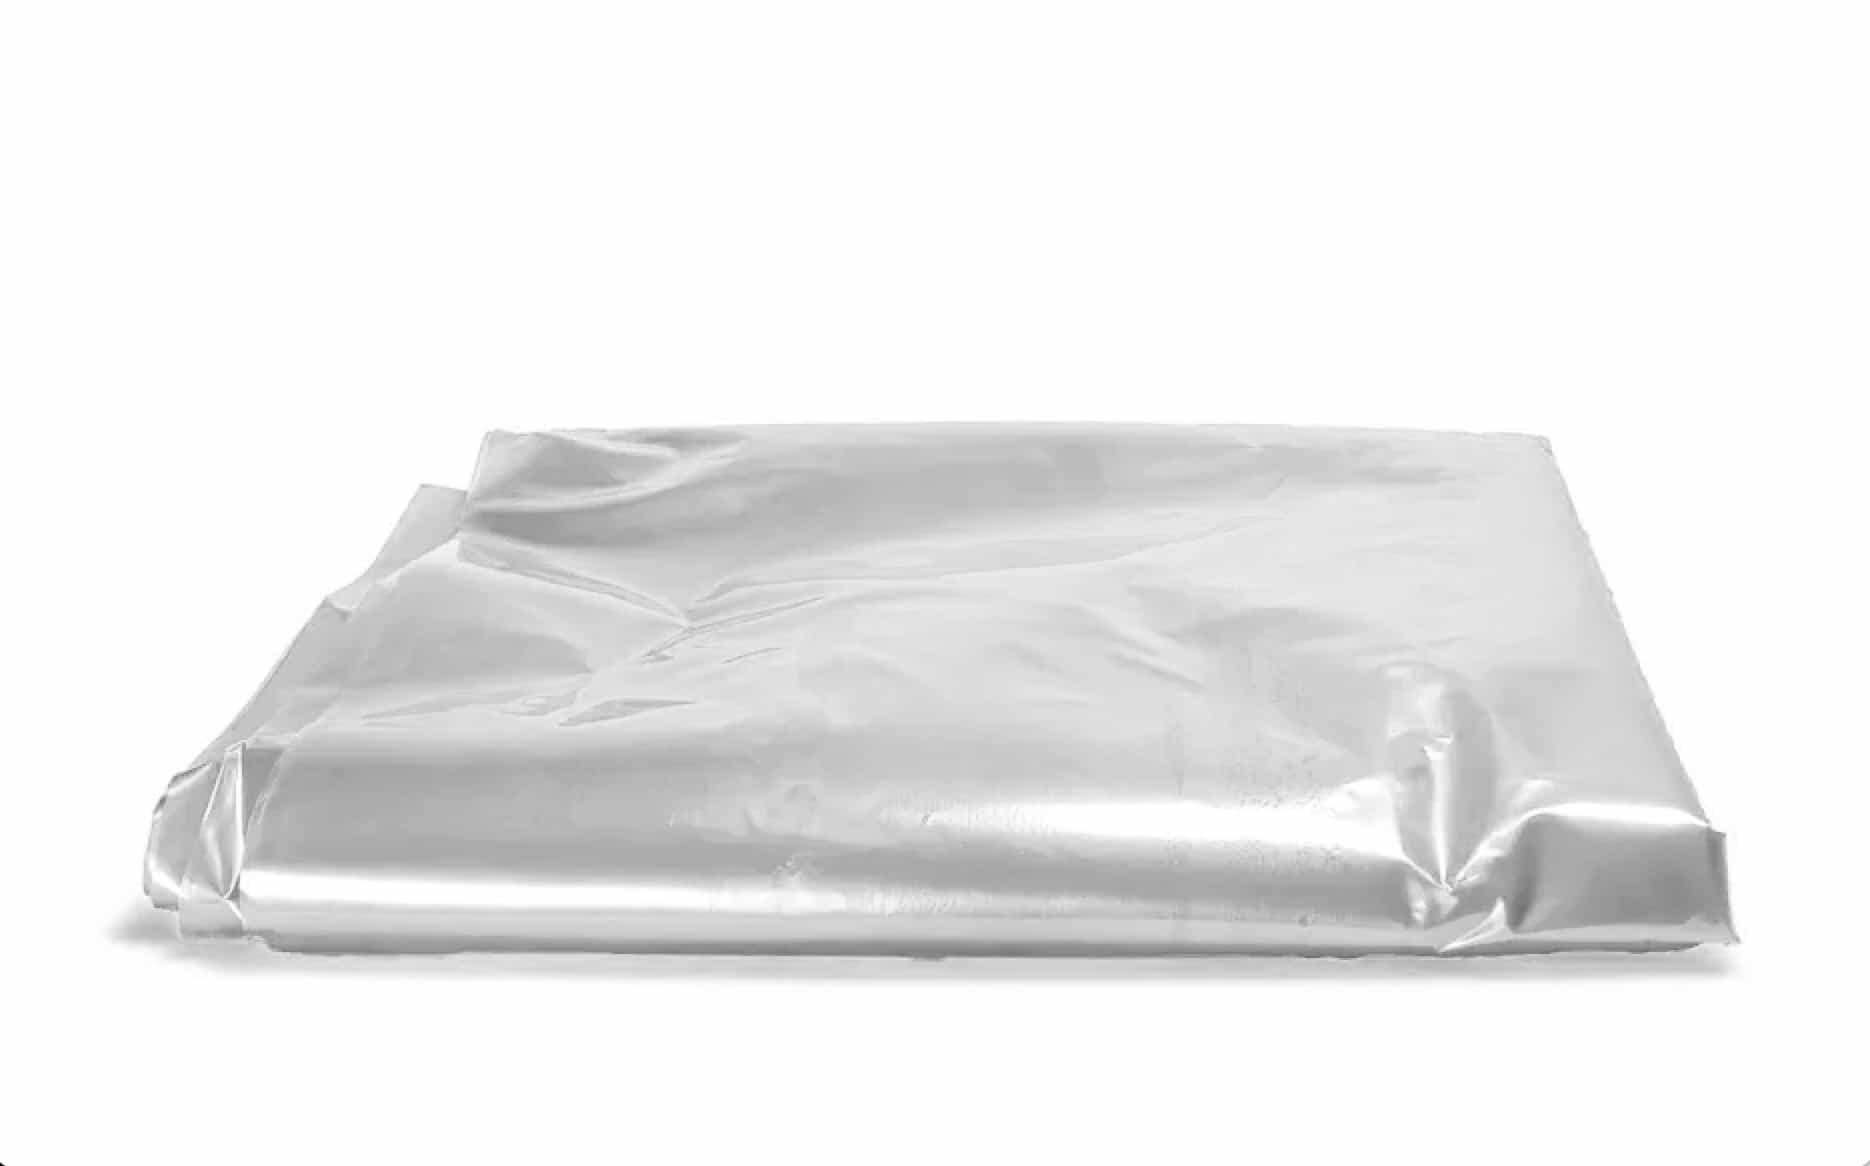 Plastic matrashoes transparant 1 persoons - 2300 x 1000 x 220mm